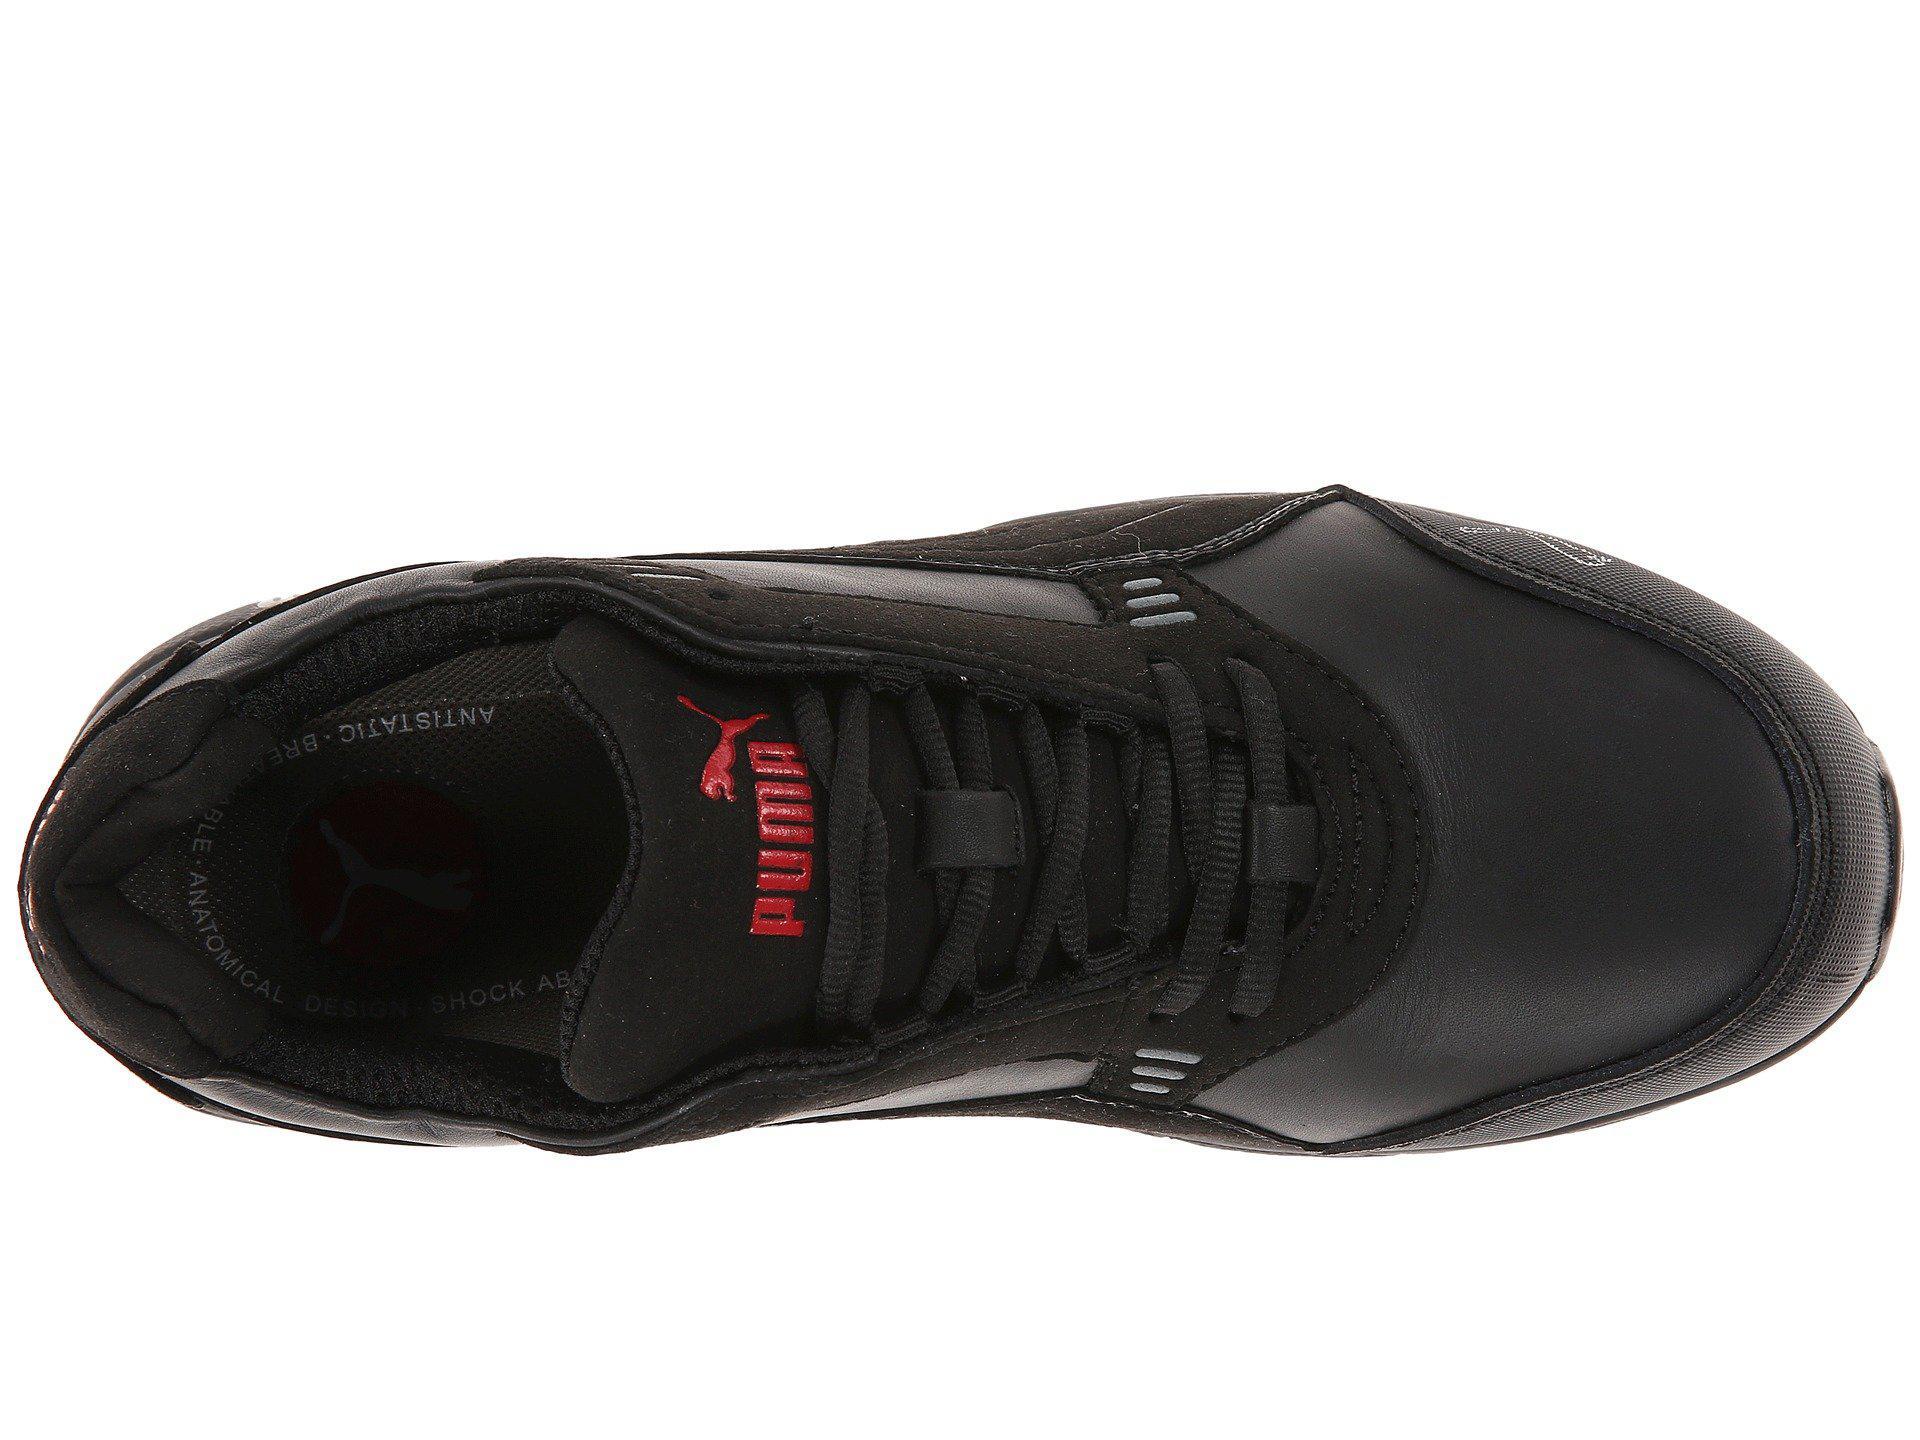 d9daf38b6bc PUMA - Multicolor Velocity Sd (black) Men s Work Boots for Men - Lyst. View  fullscreen